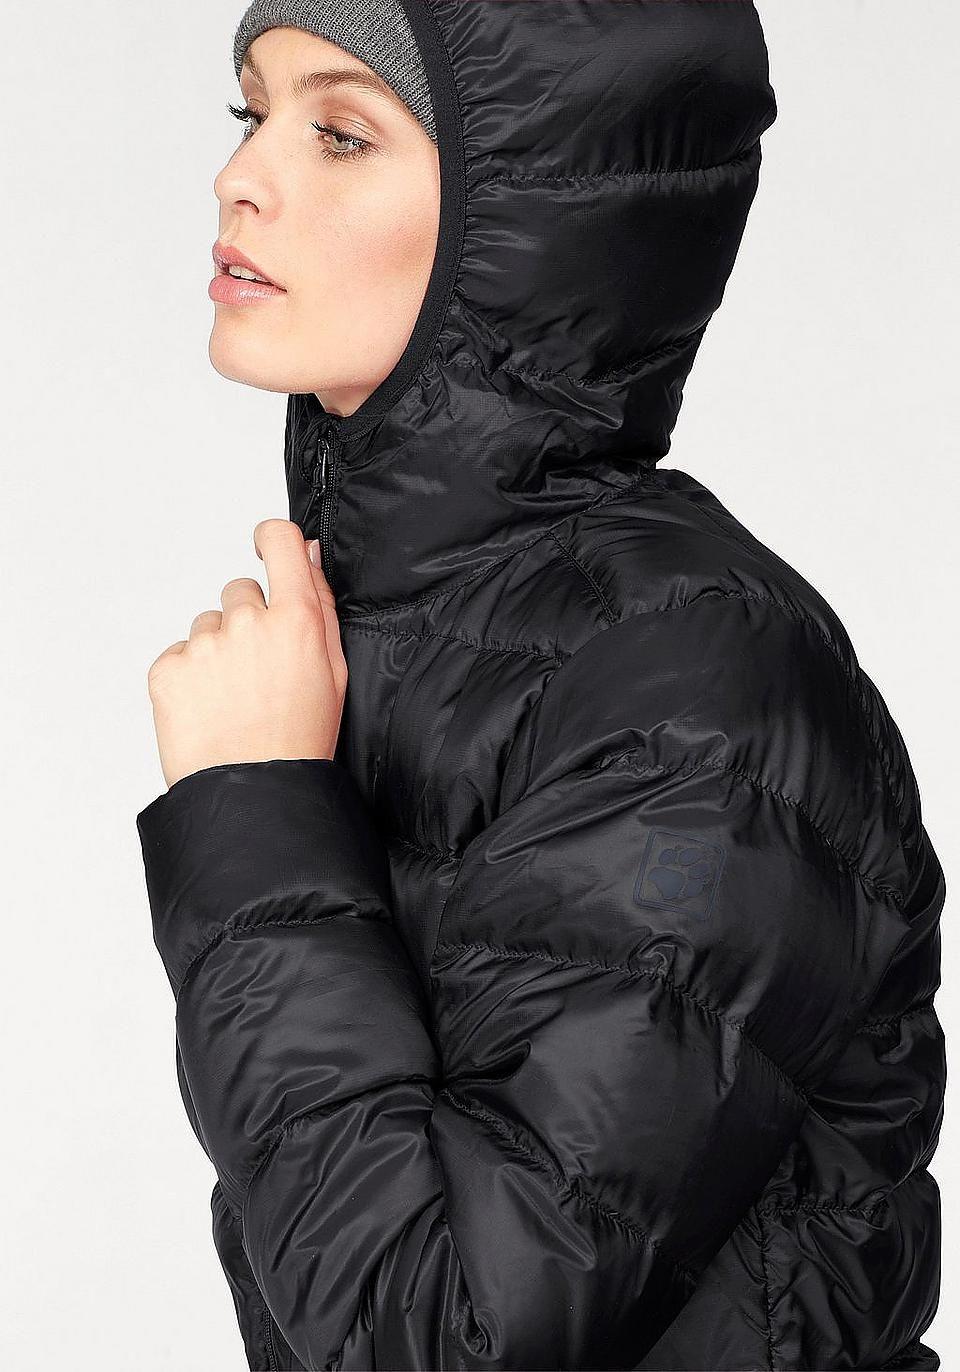 Jack Wolfskin Daunenjacke Falkland Women Online Baur Daunenjacke Daunenjacke Damen Daunen Jacke